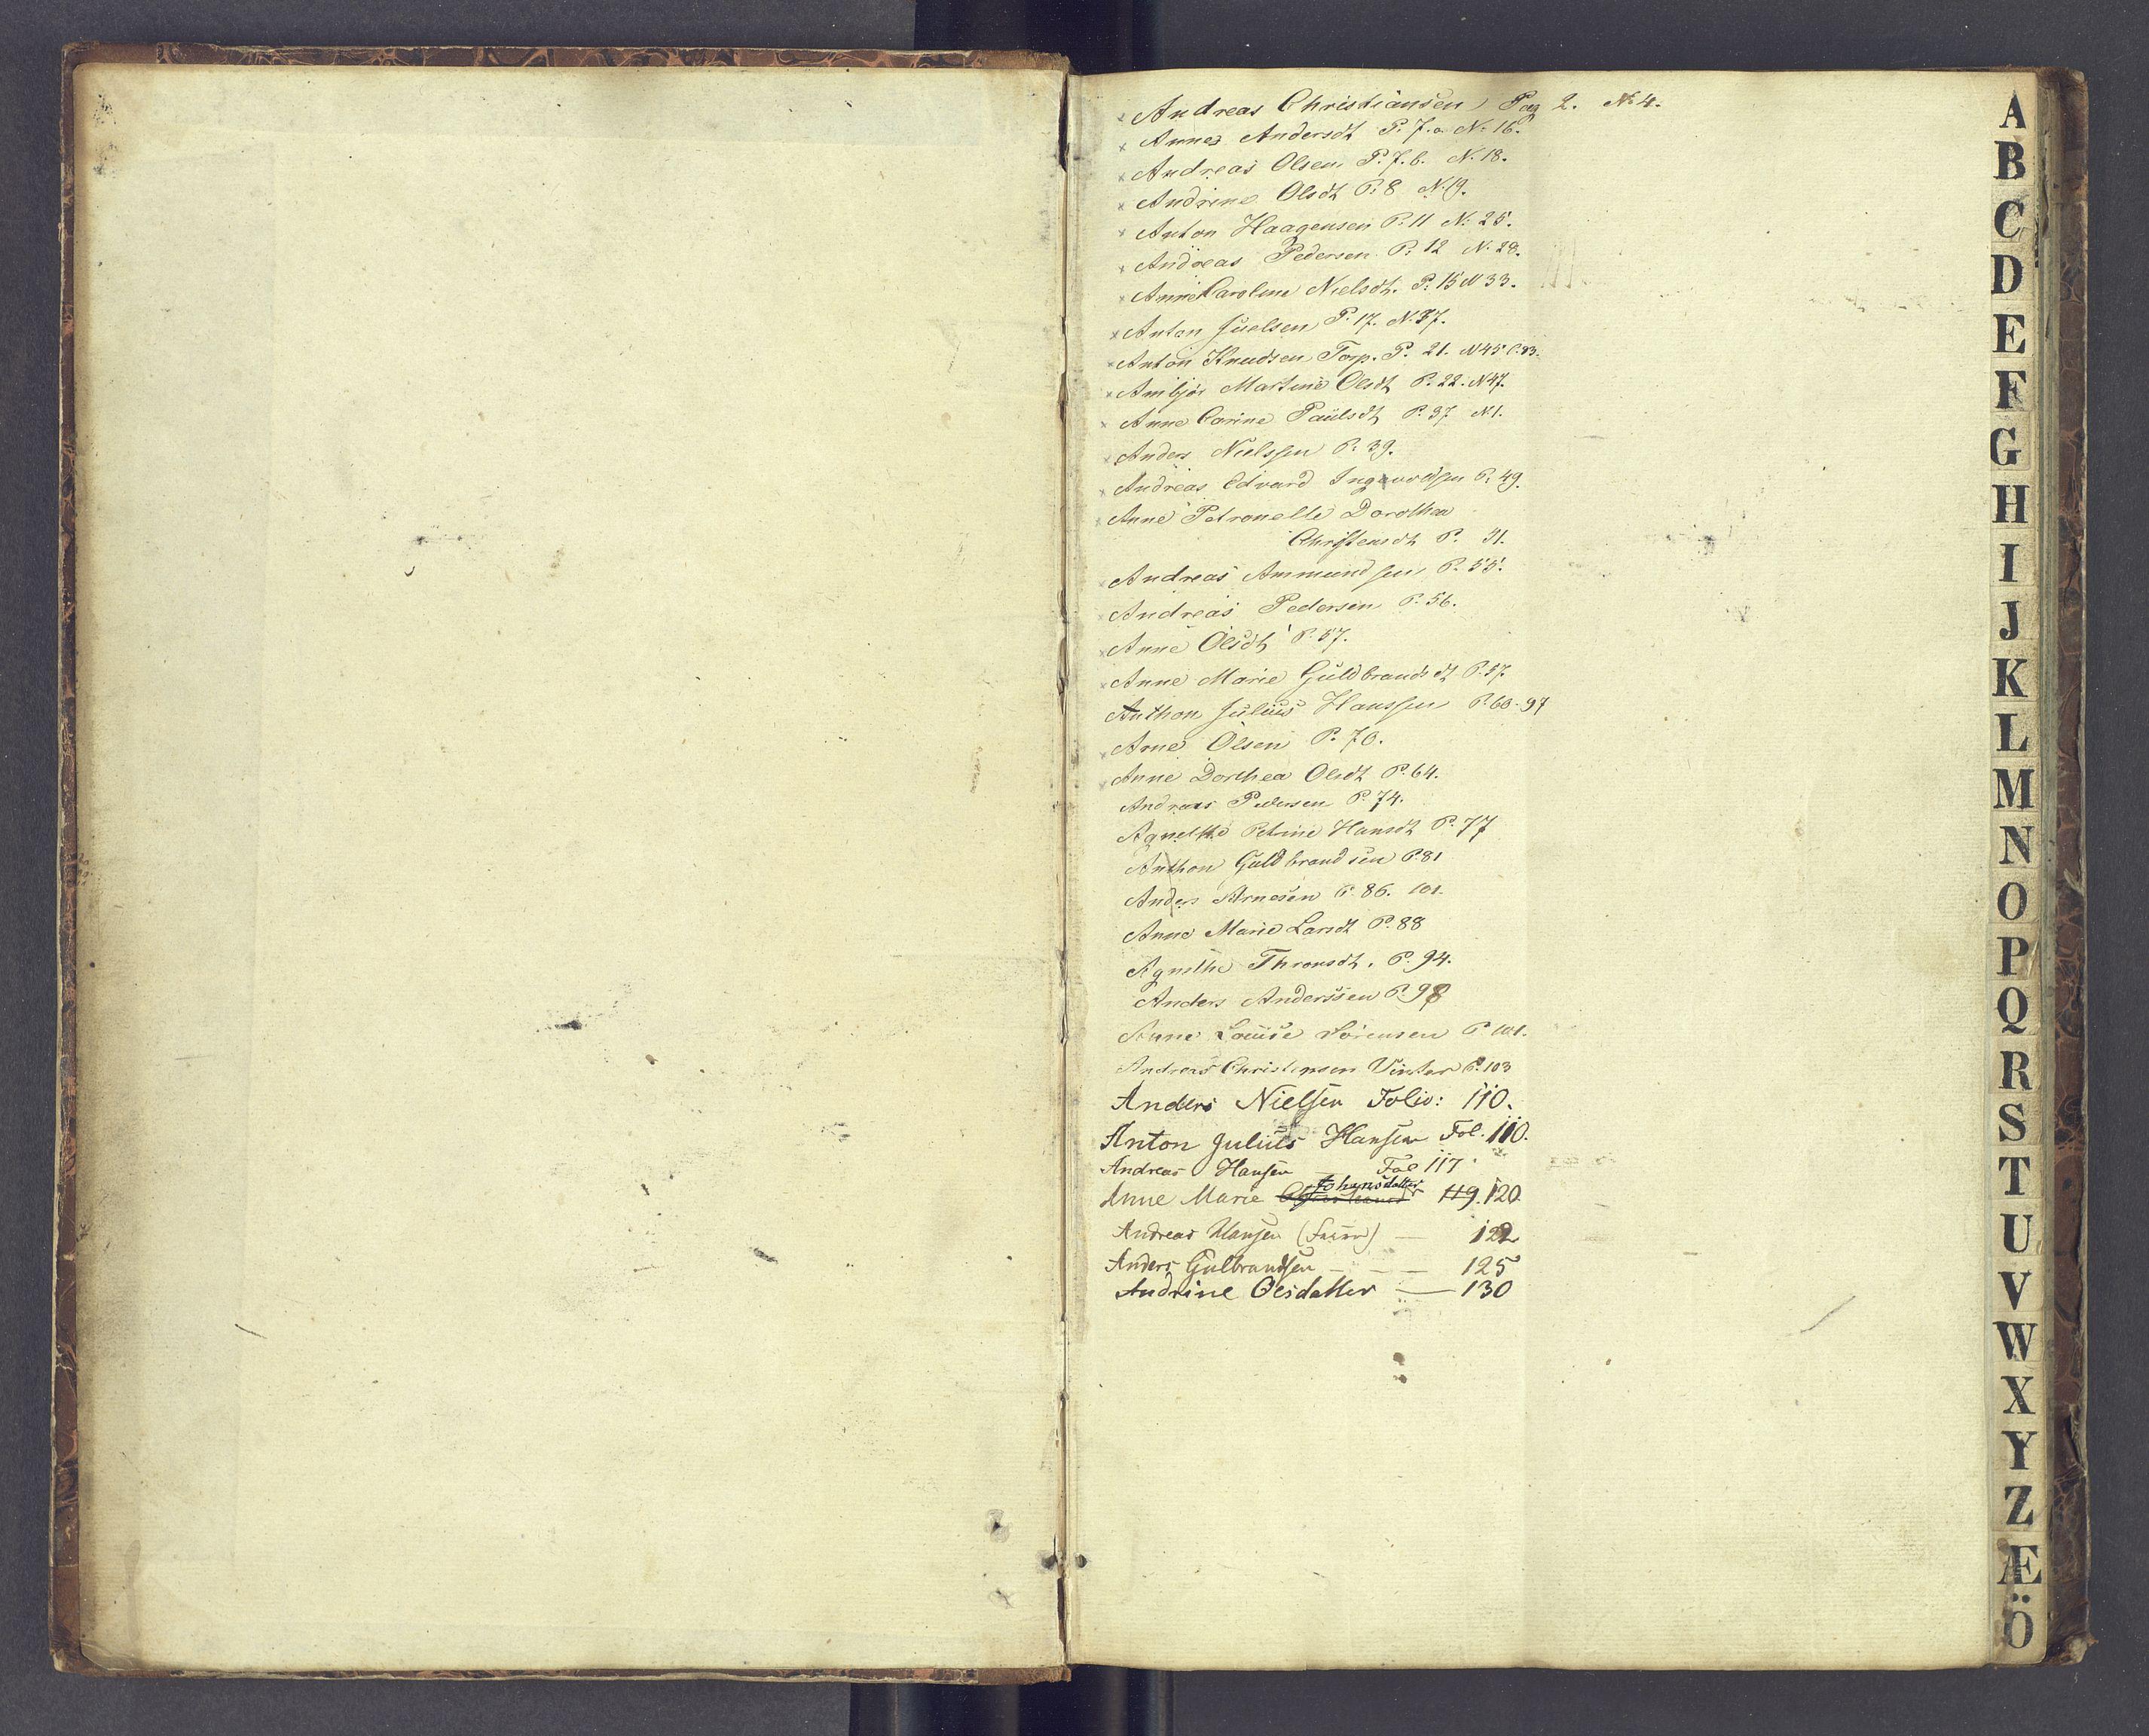 SAH, Toftes Gave, F/Fc/L0001: Elevprotokoll, 1841-1847, s. upaginert